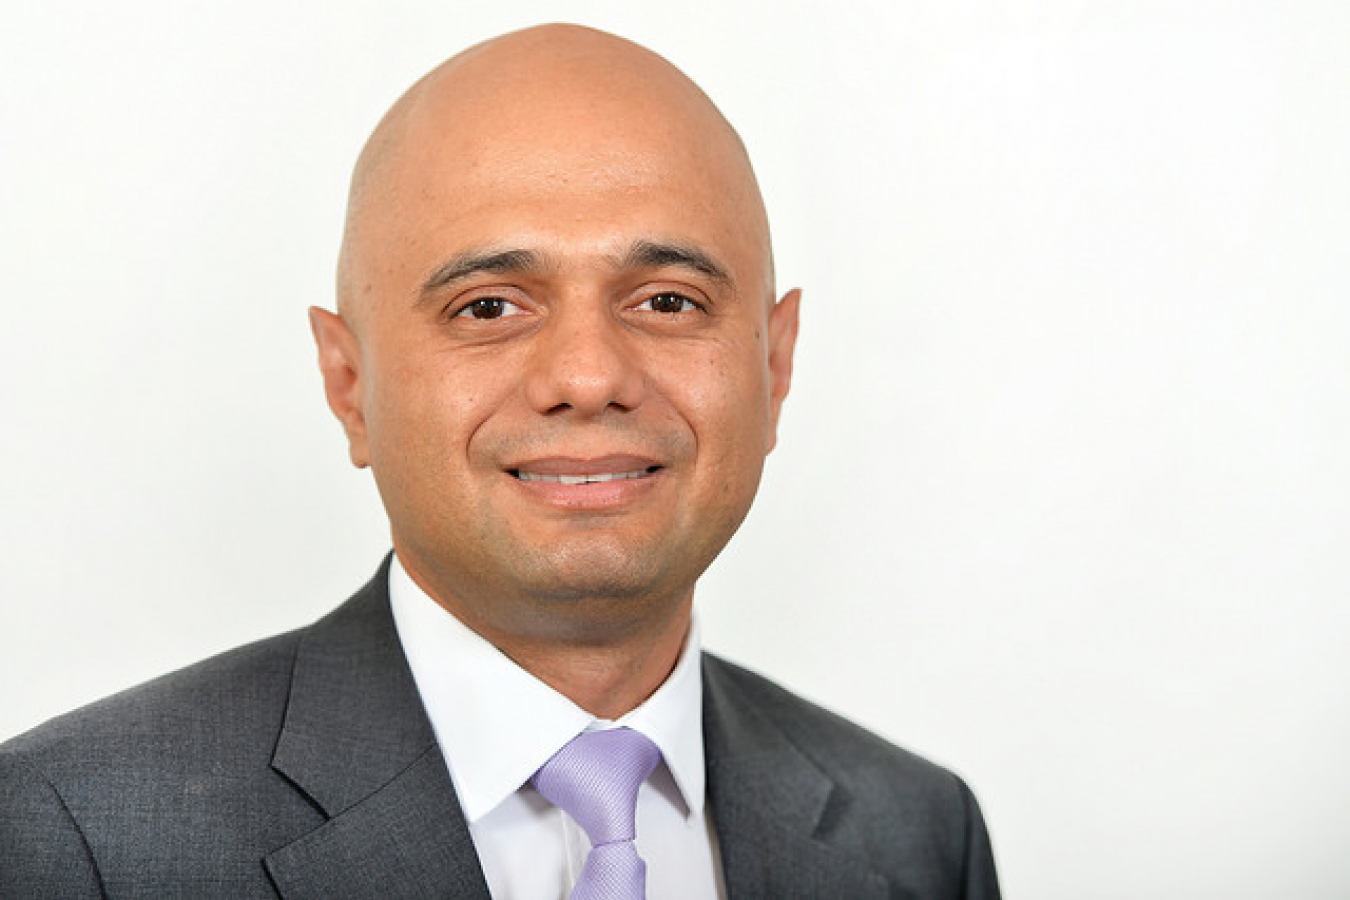 Sajid Javid MP, UK Communities Secretary and son of a Pakistani Immigrant